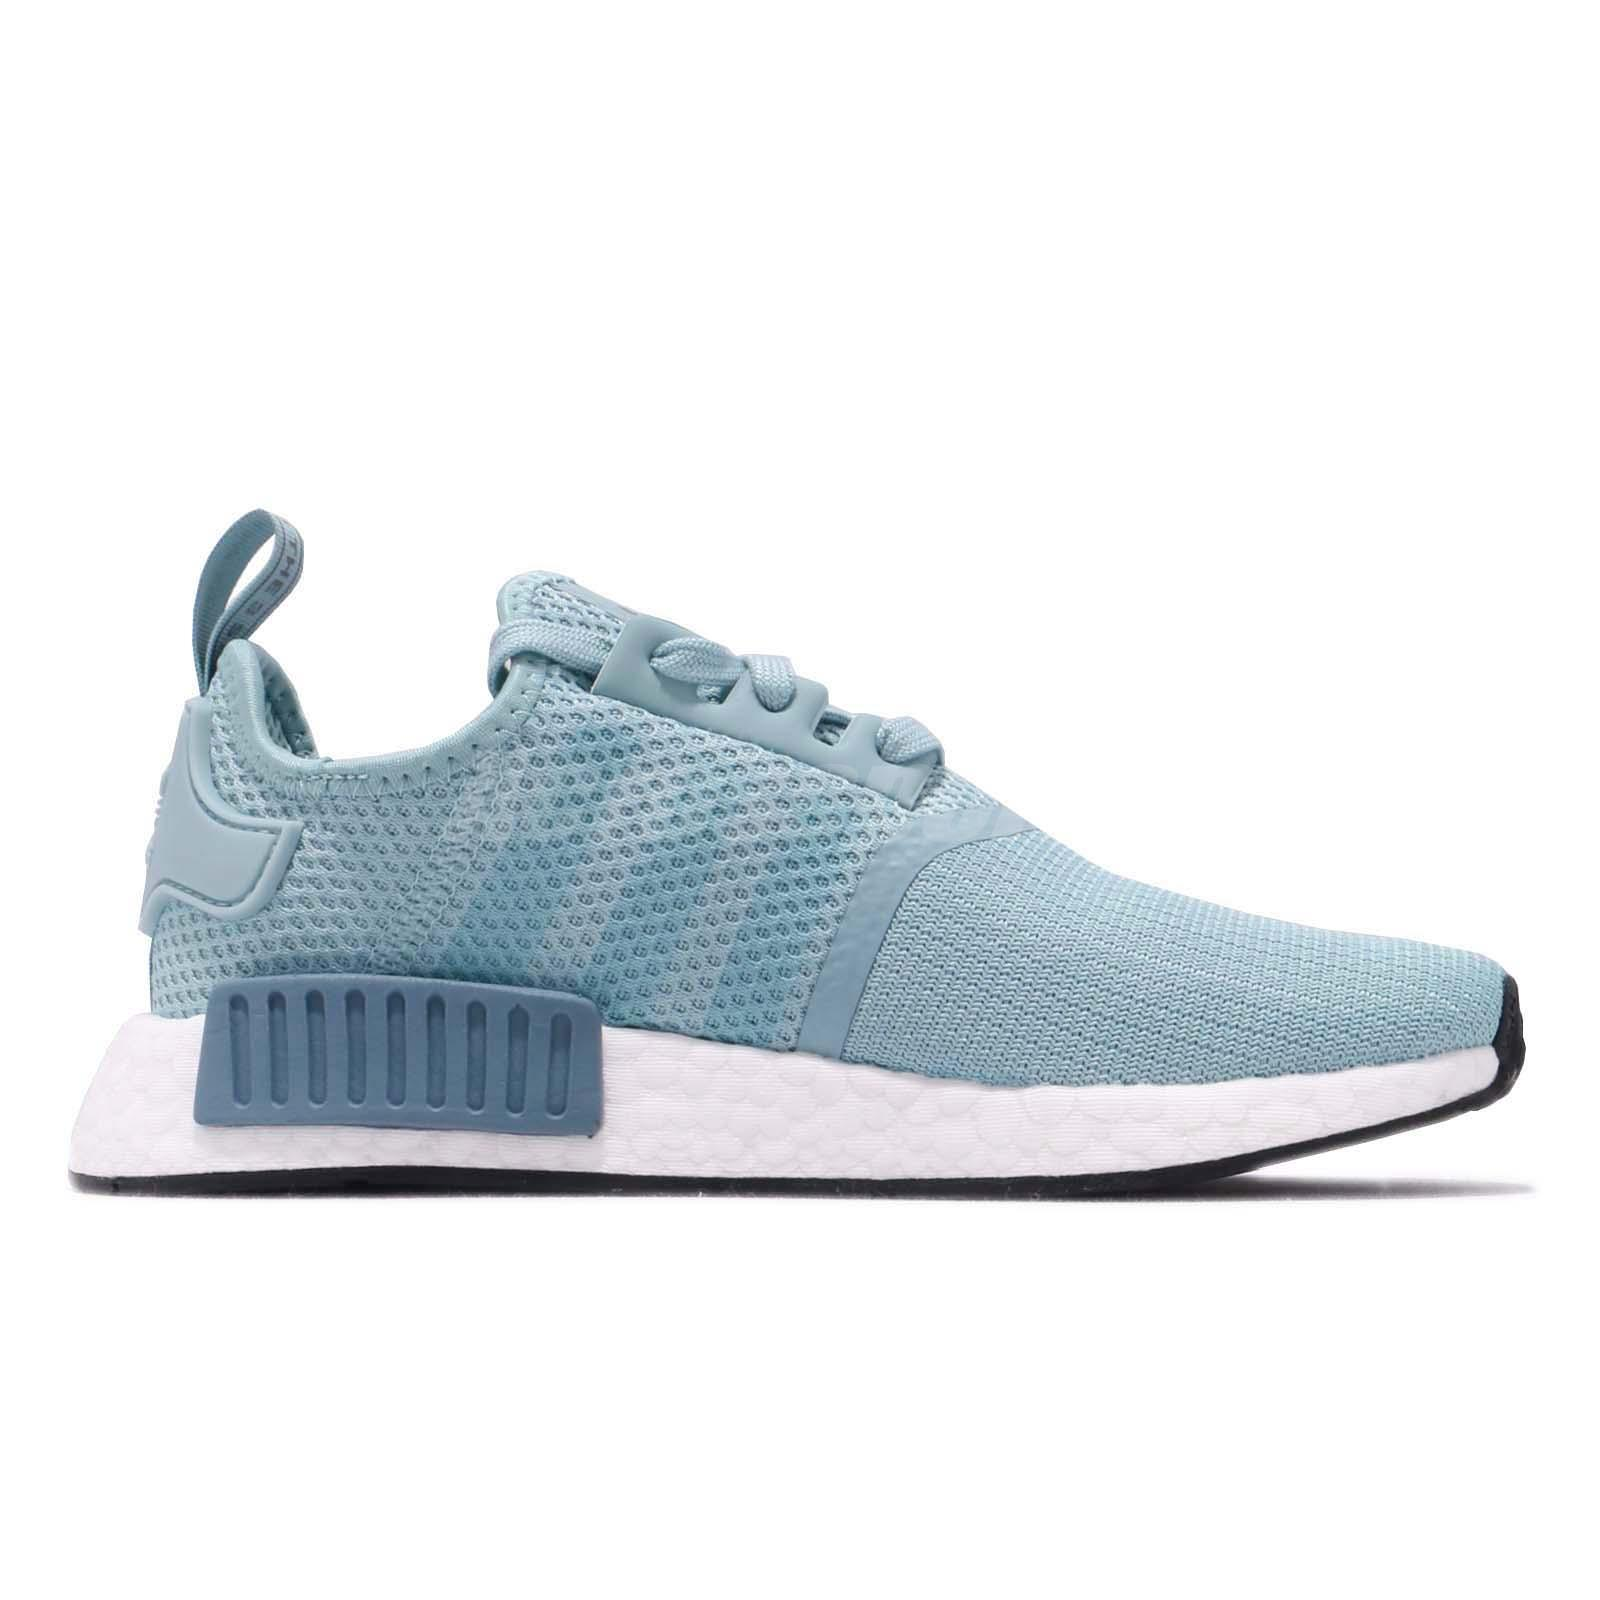 Détails sur adidas Originals NMD_R1 W Boost Blue White Women Running Shoes Sneakers BD8030